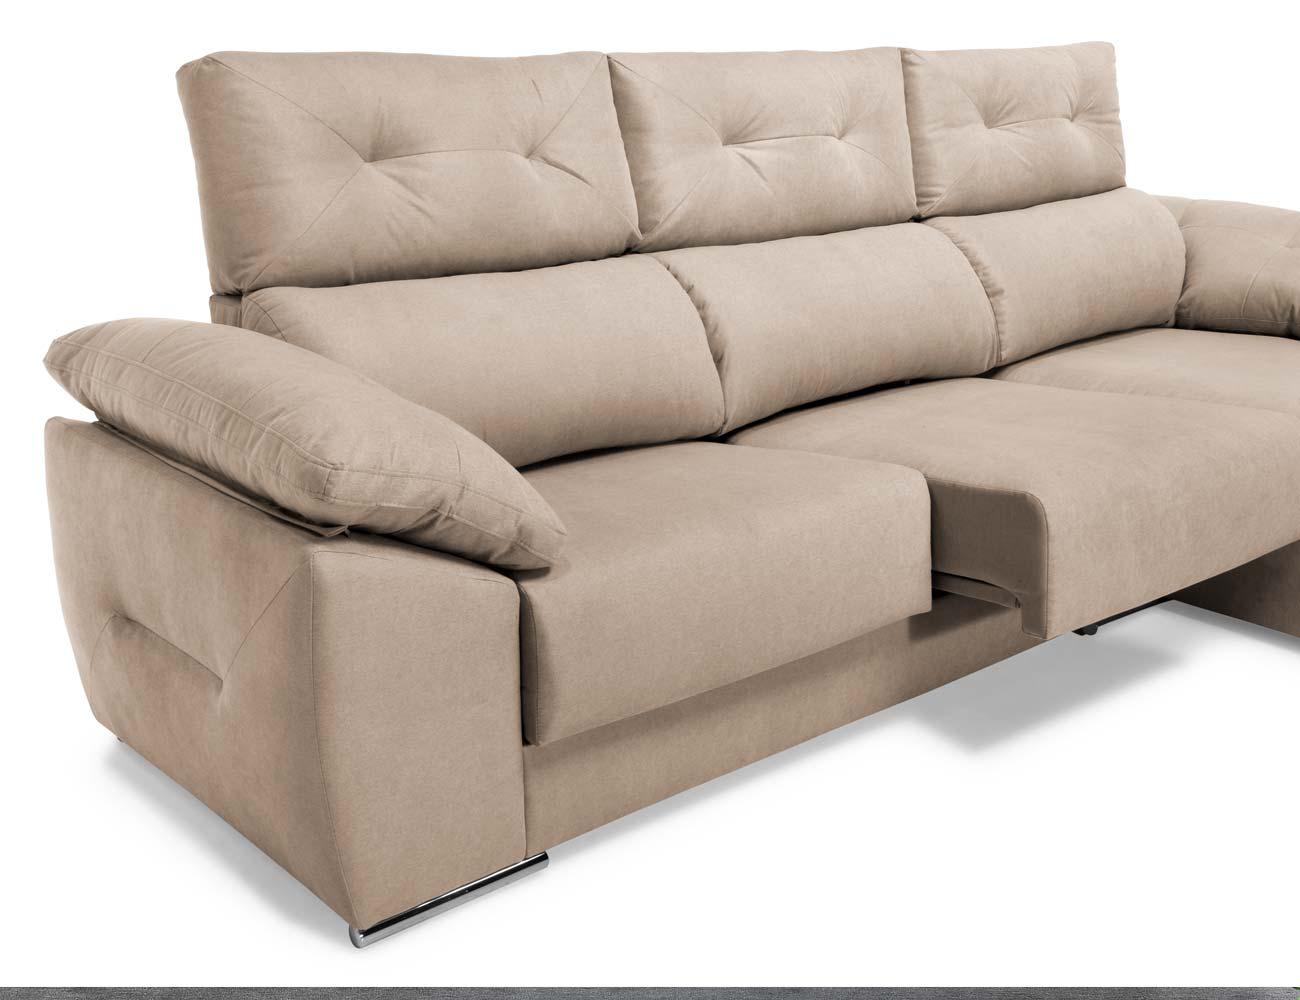 Sofa chaiselongue viena 2